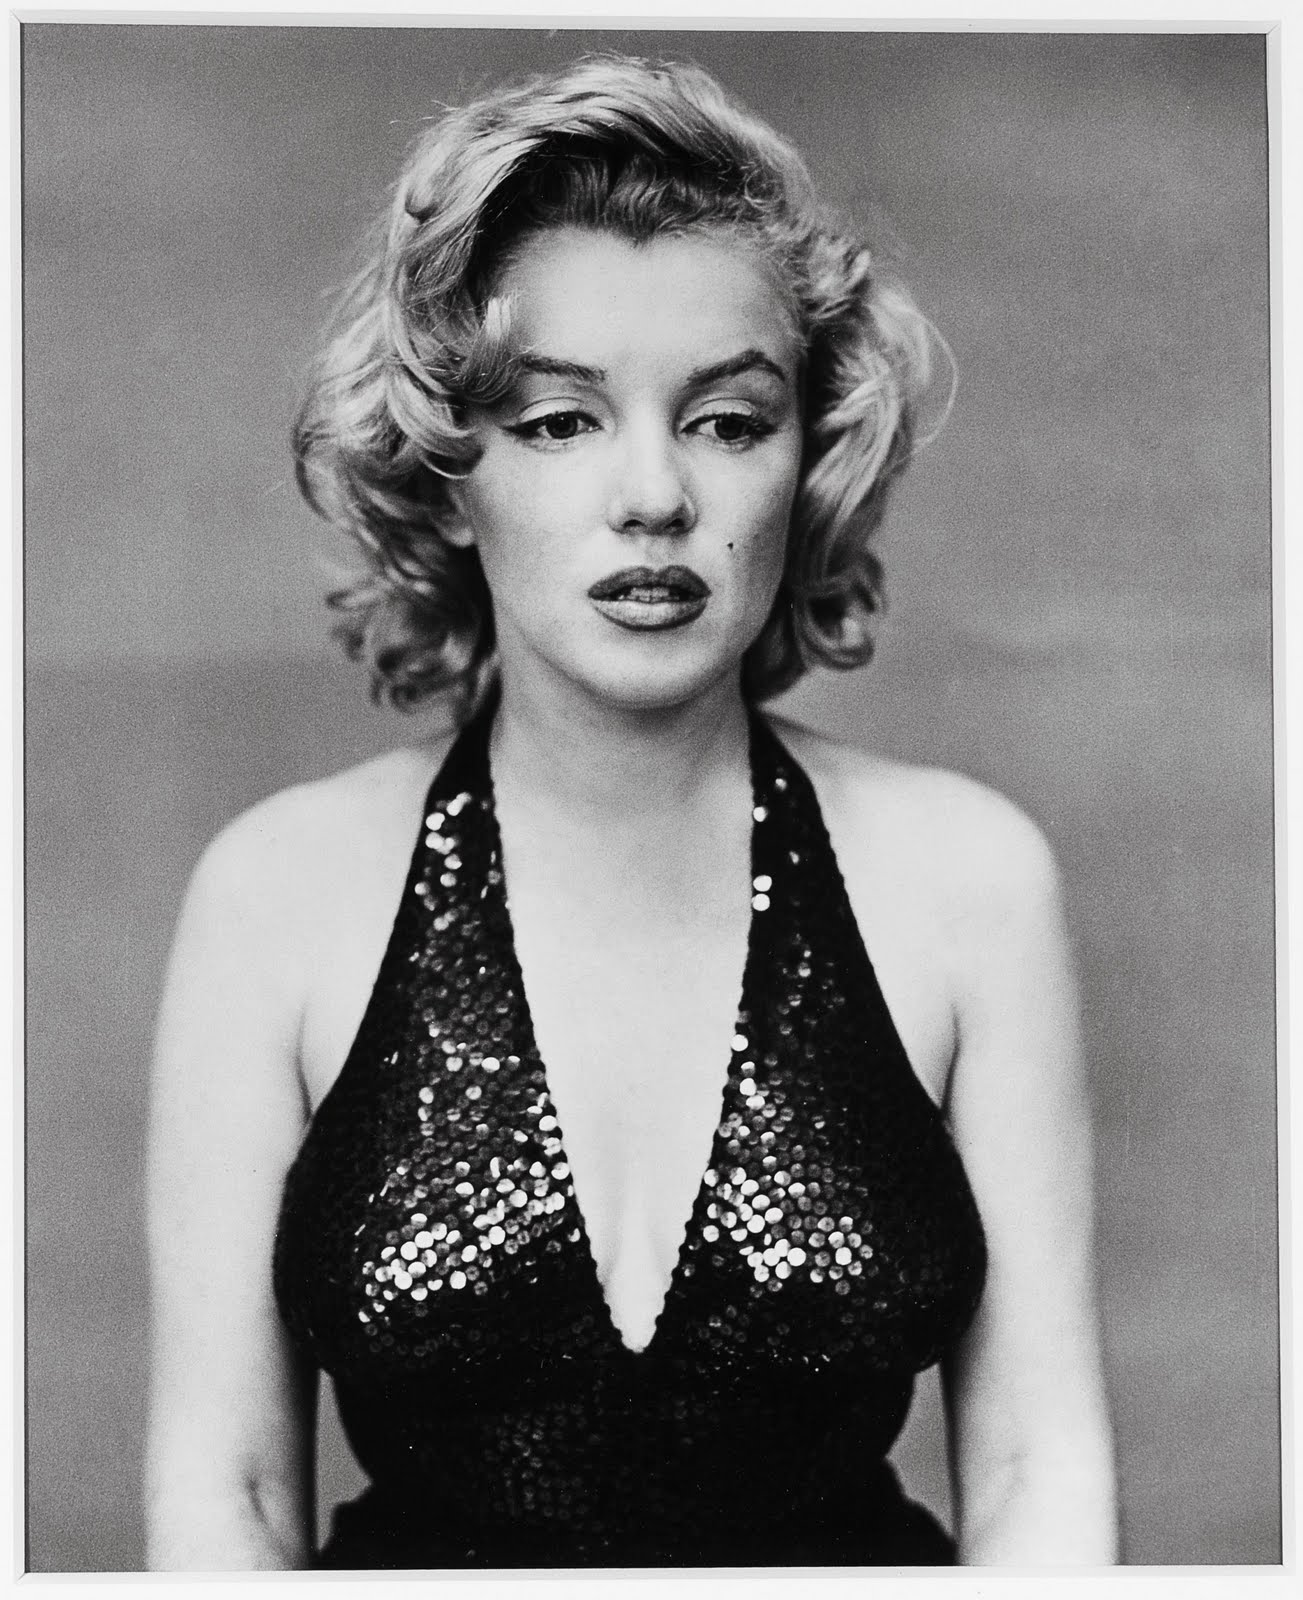 http://2.bp.blogspot.com/-pZCsi4zJBus/TeAE9Afyi6I/AAAAAAAAG_8/j6strtVtblo/s1600/Marilyn+Monroe+portraits+%25282%2529.jpg